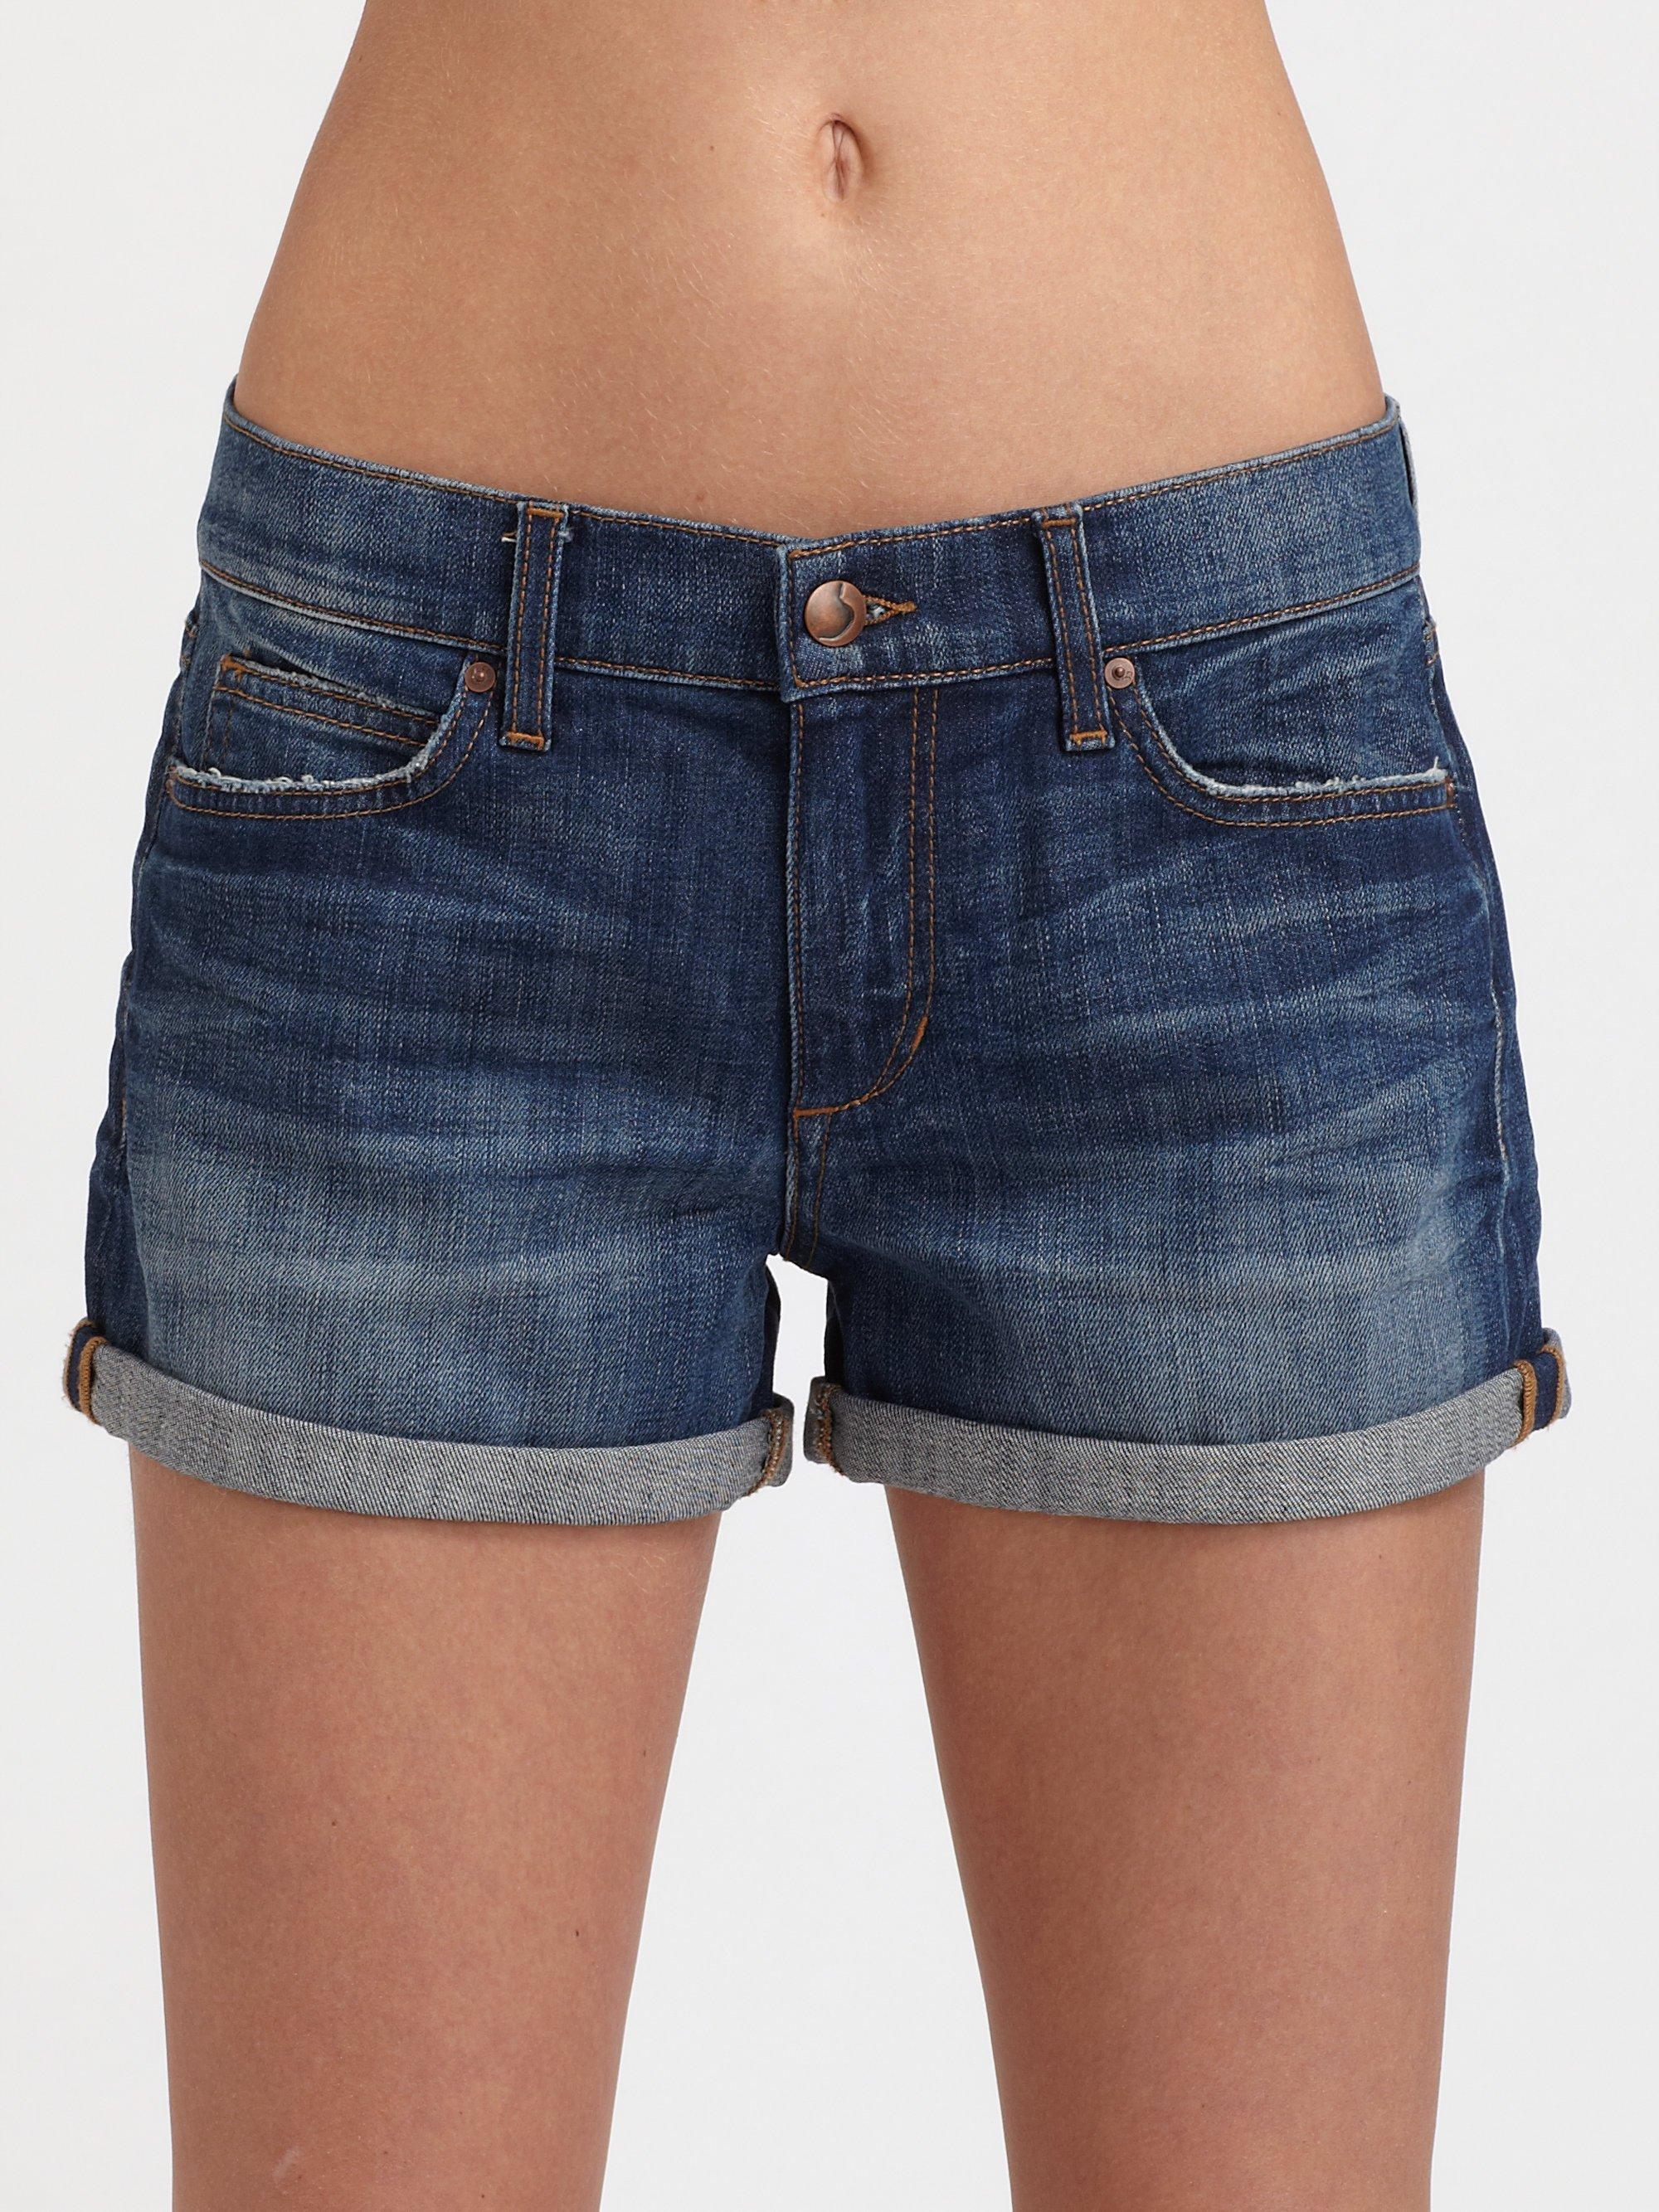 Joe's jeans Cuffed Midrise Denim Shorts in Blue | Lyst